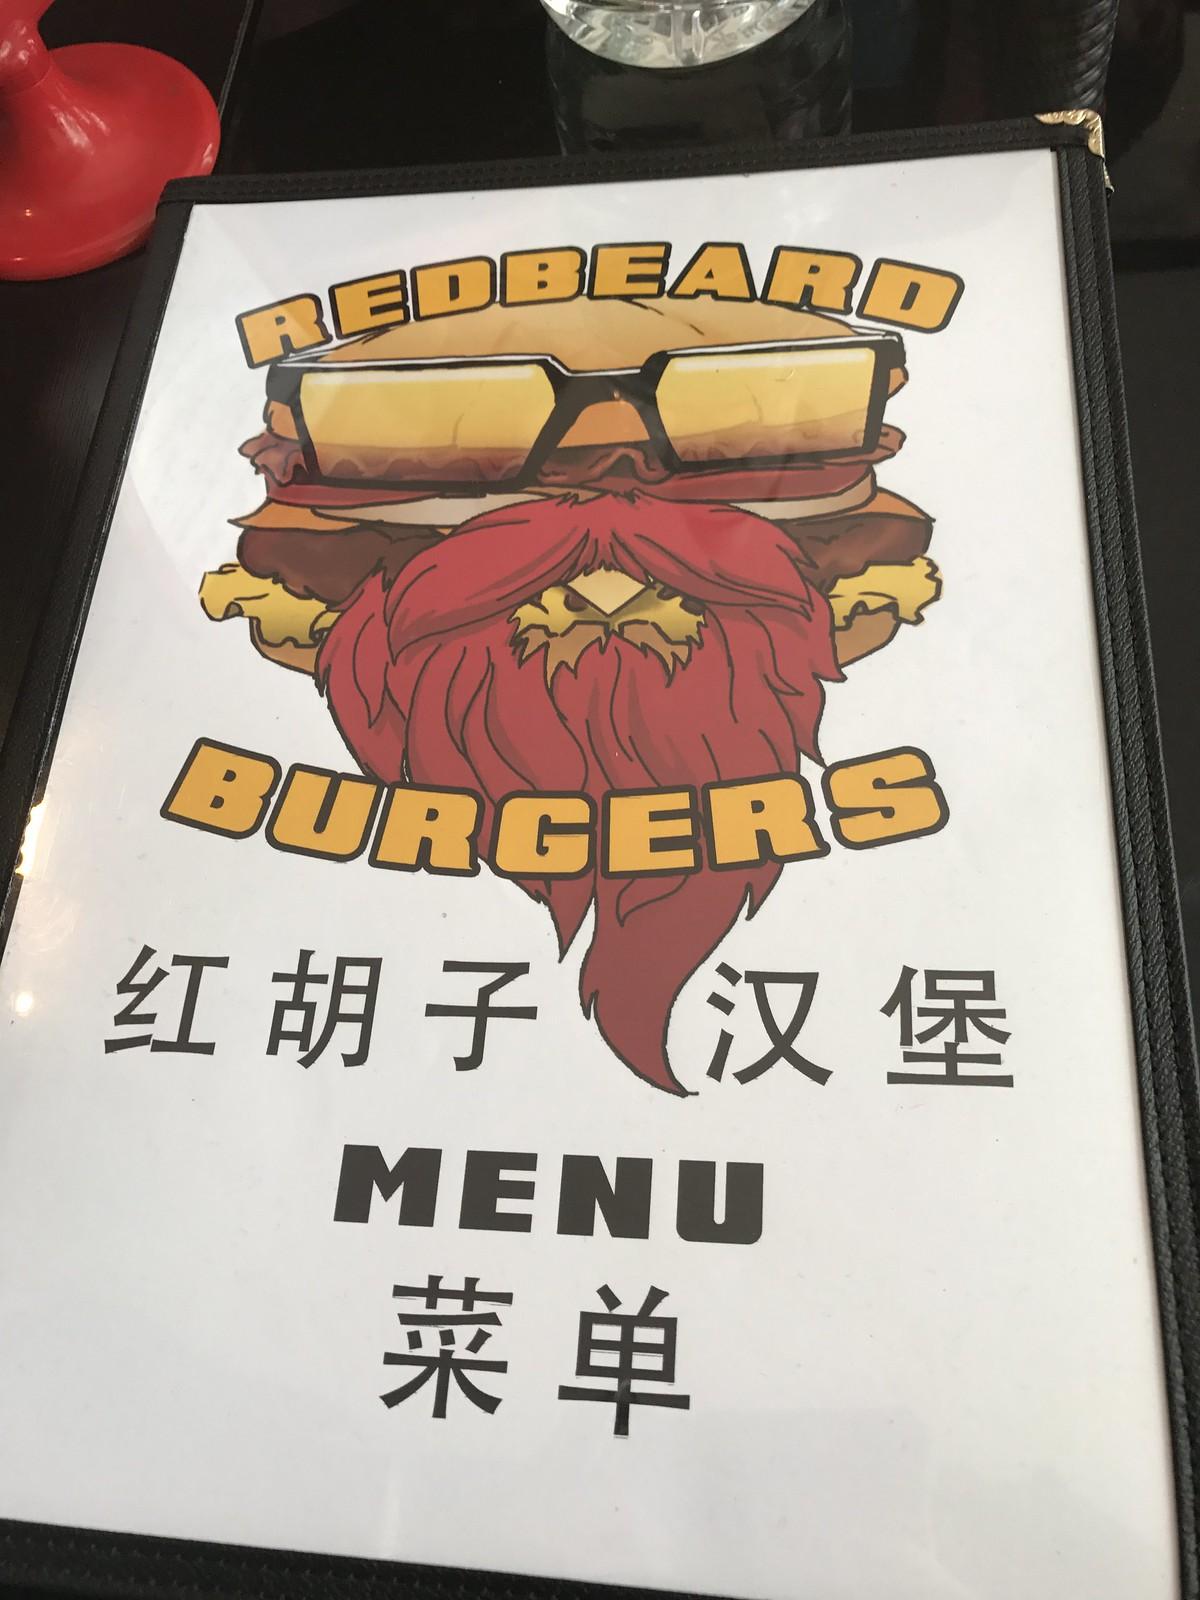 Red Beard Burgers